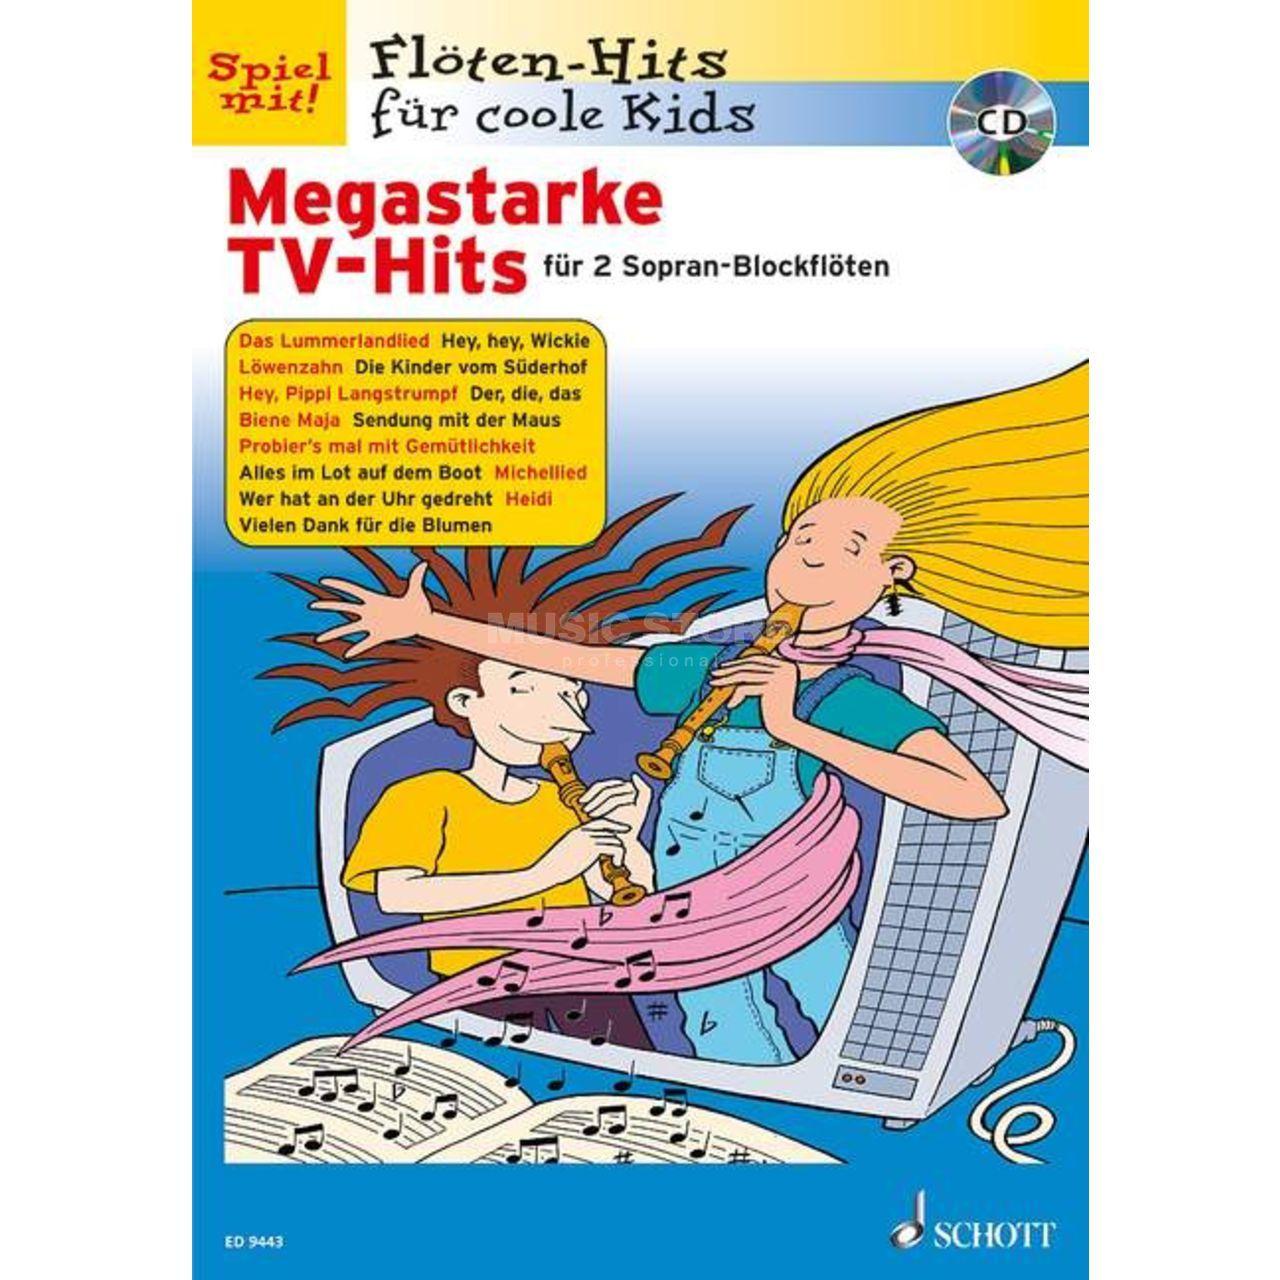 Our accessories tips for Schott Music Megastarke TV-Hits 1 mit CD 1-2 Sopran-Blockflöten